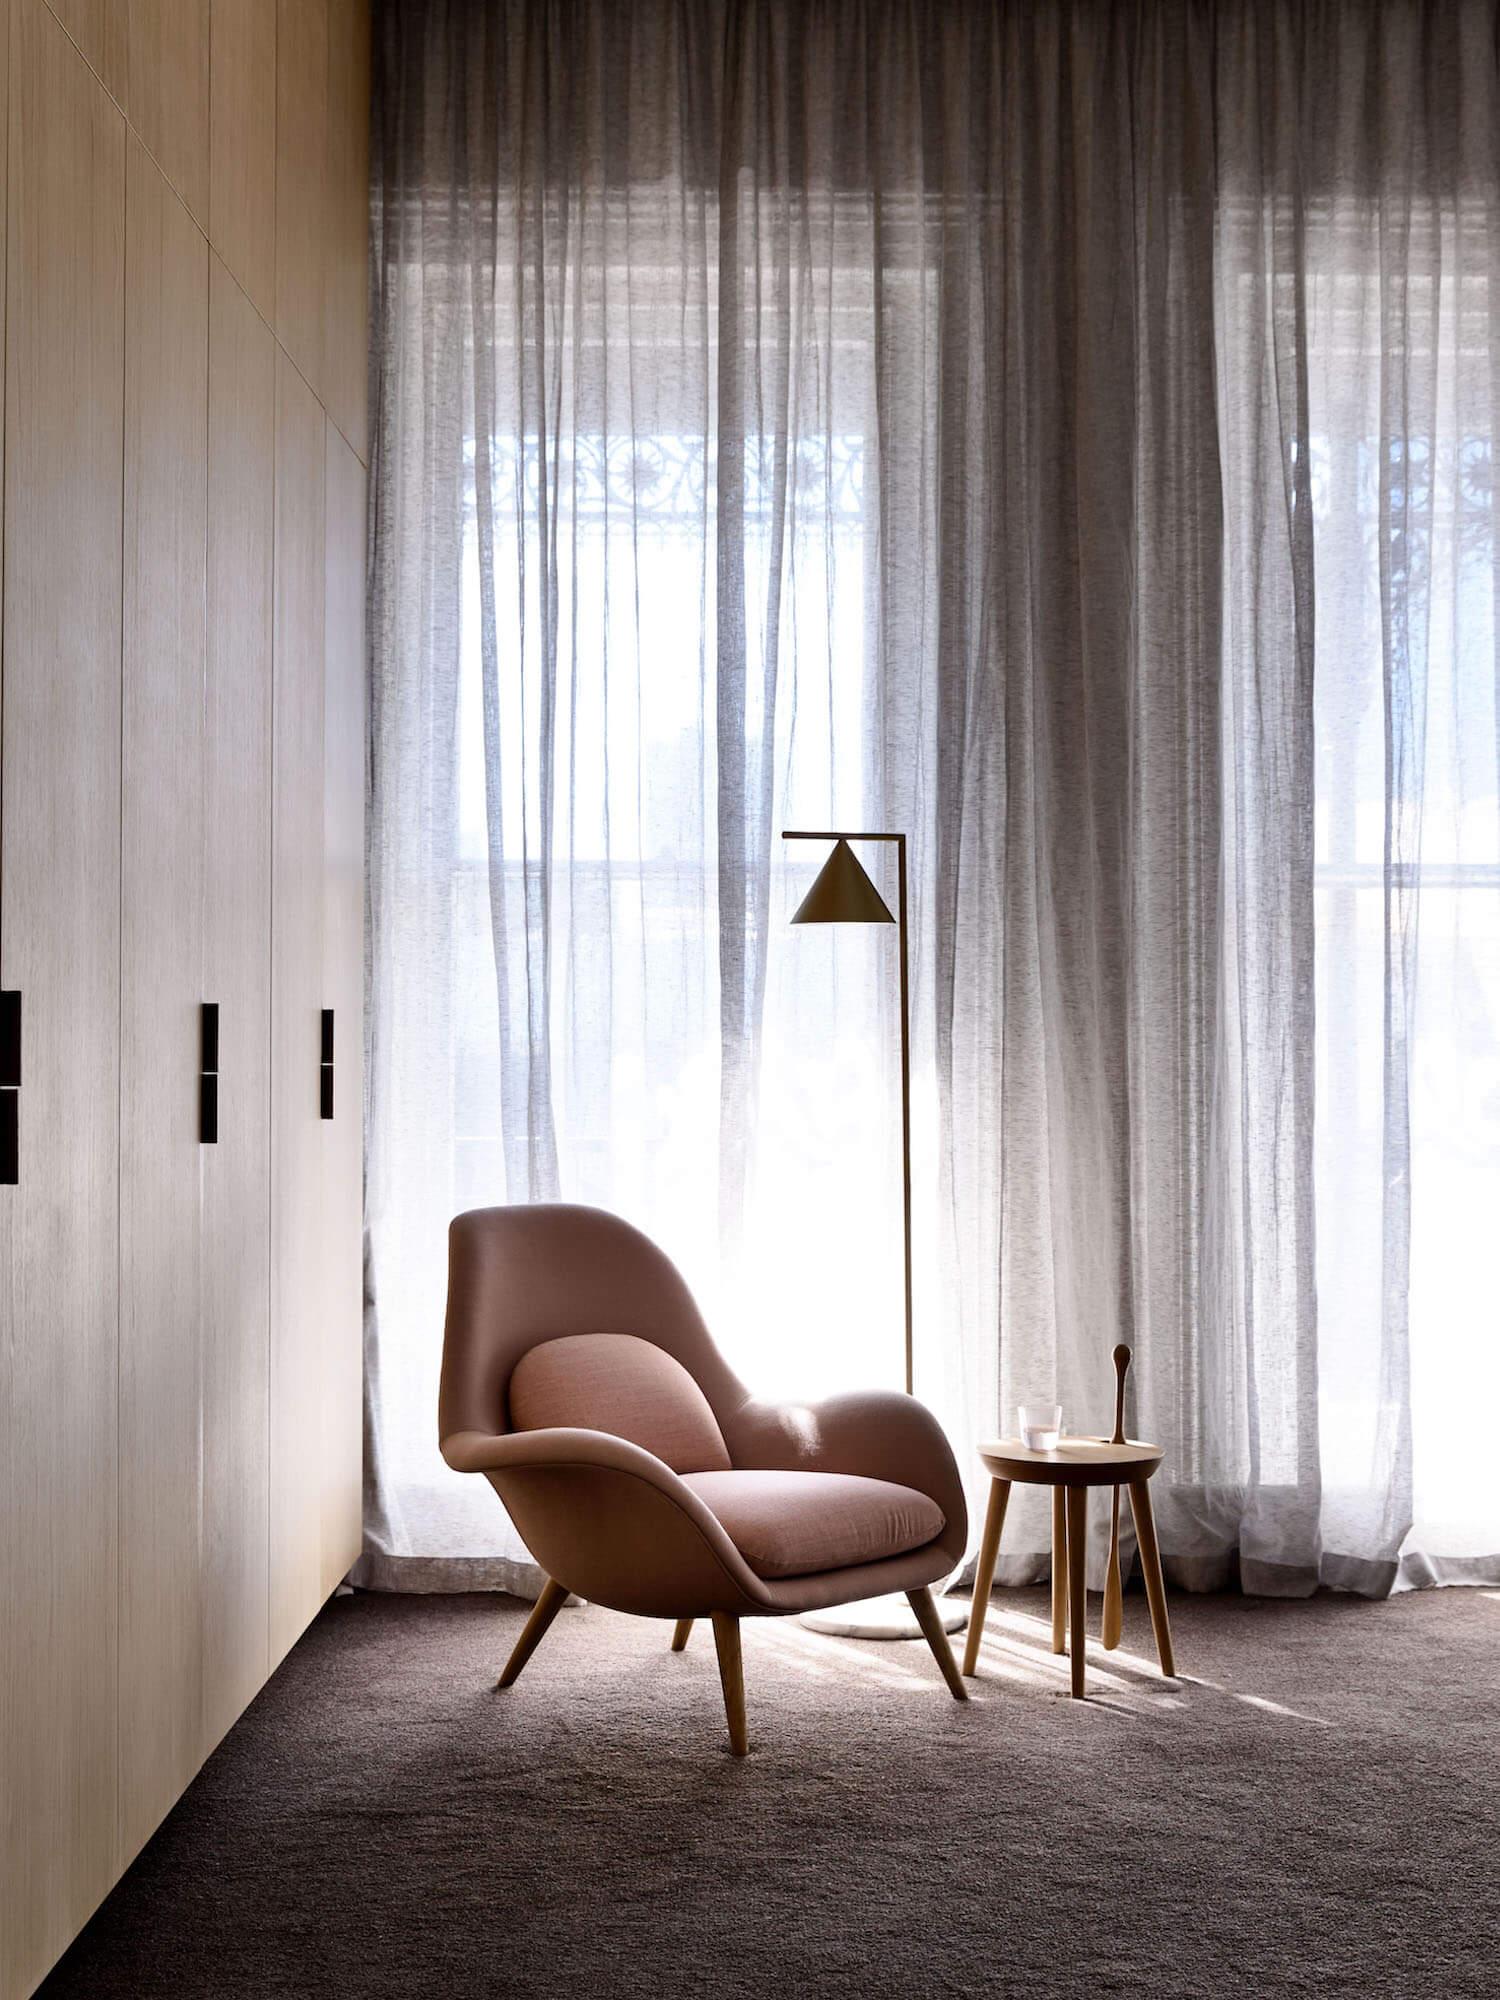 est living interview matt gibson architecture and design 7